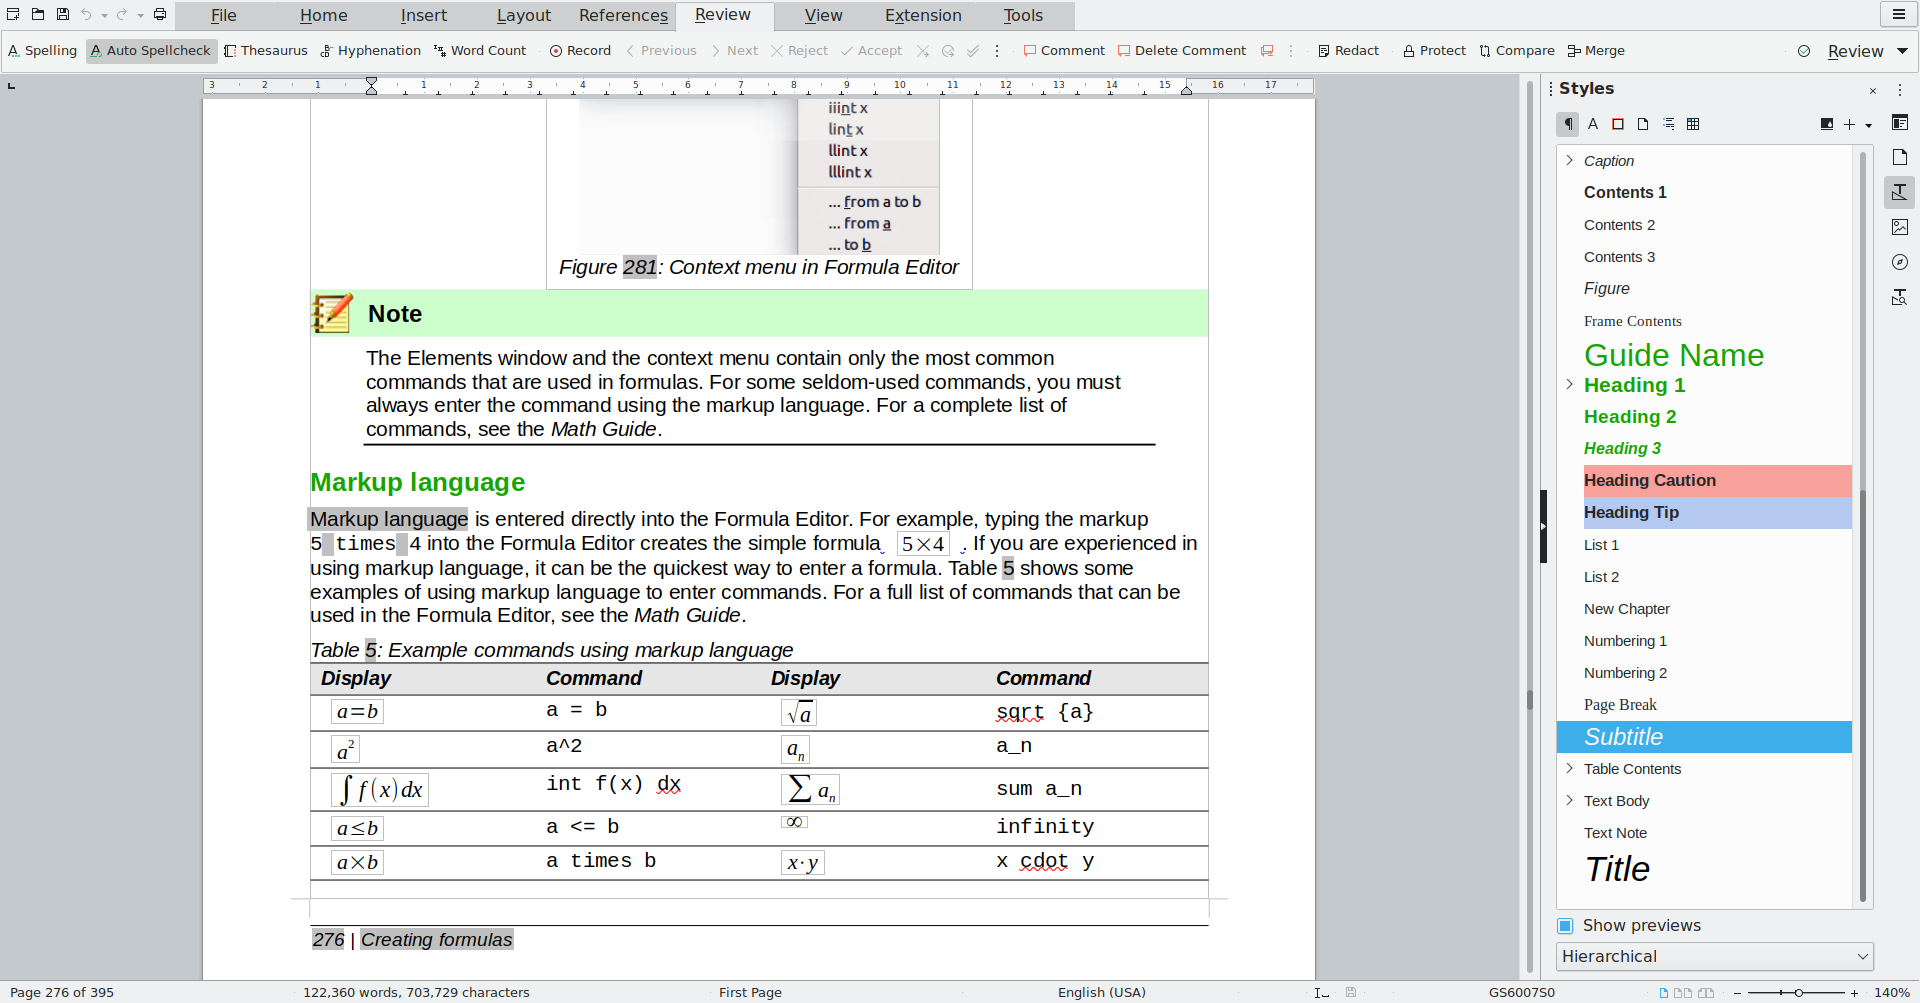 A screenshot of LibreOffice